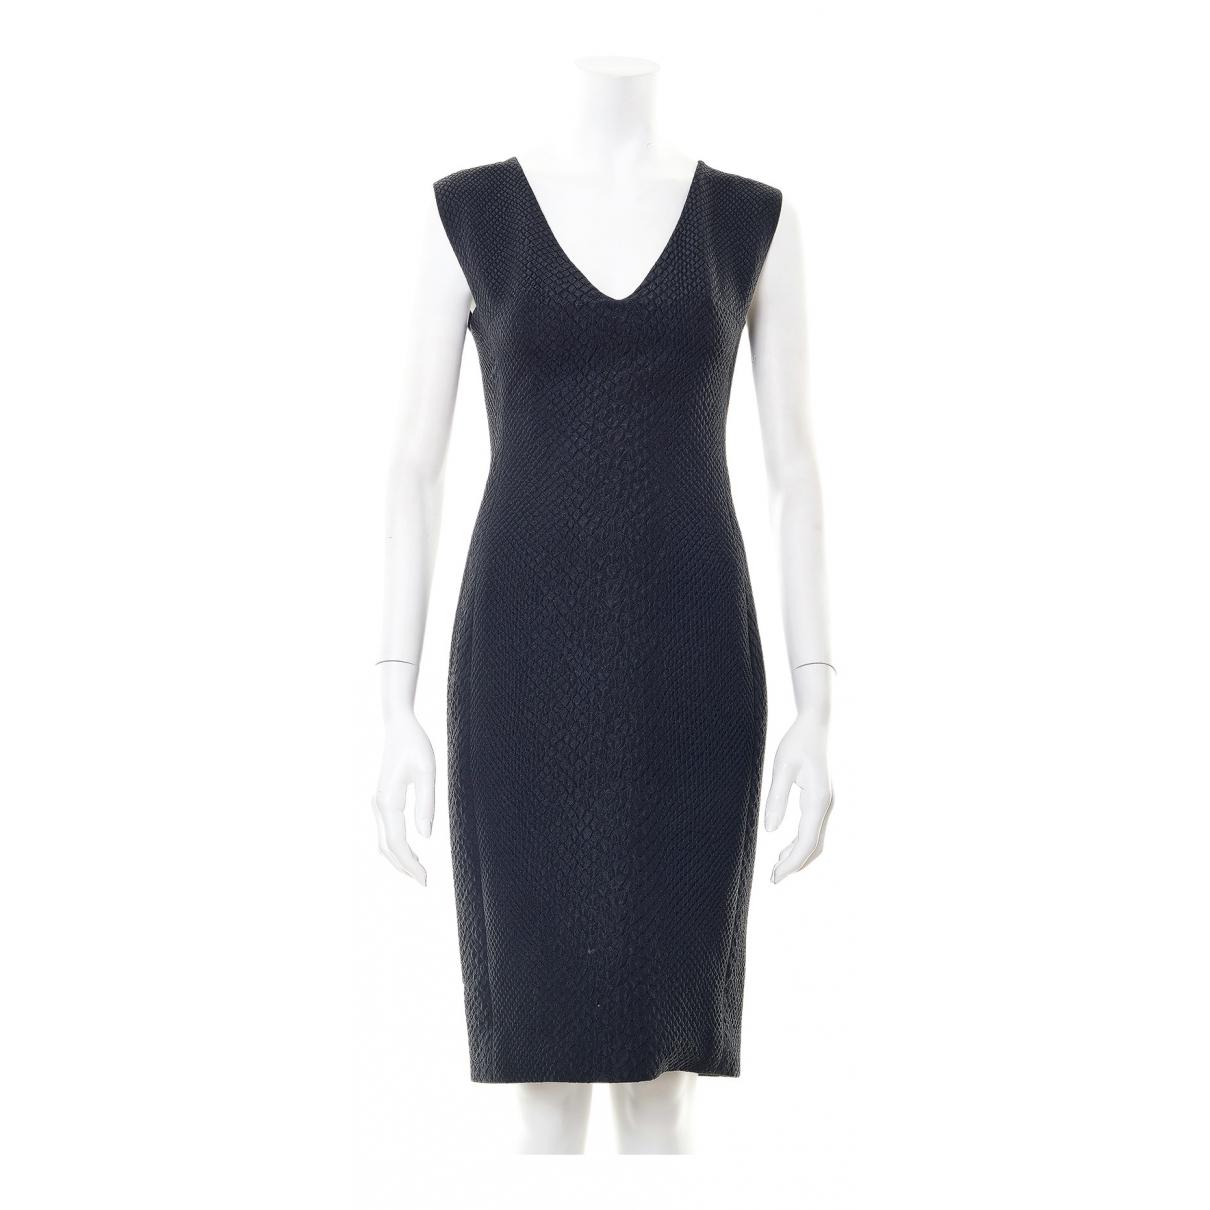 Lanvin \N Kleid in  Schwarz Synthetik